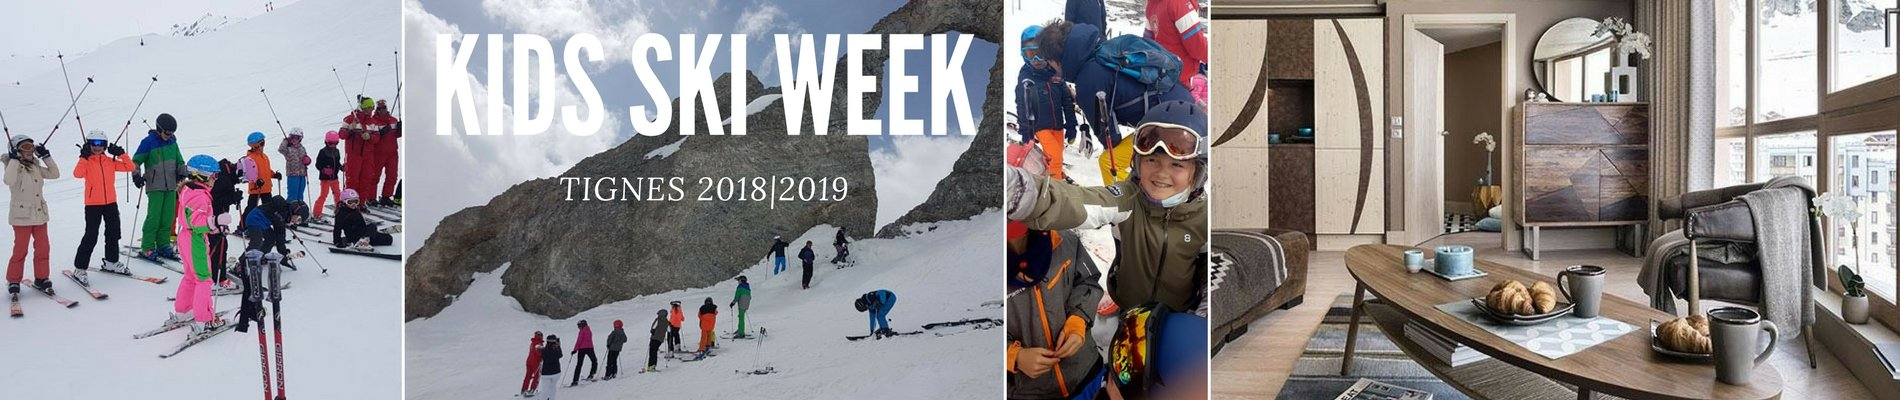 kids ski week 1900x400